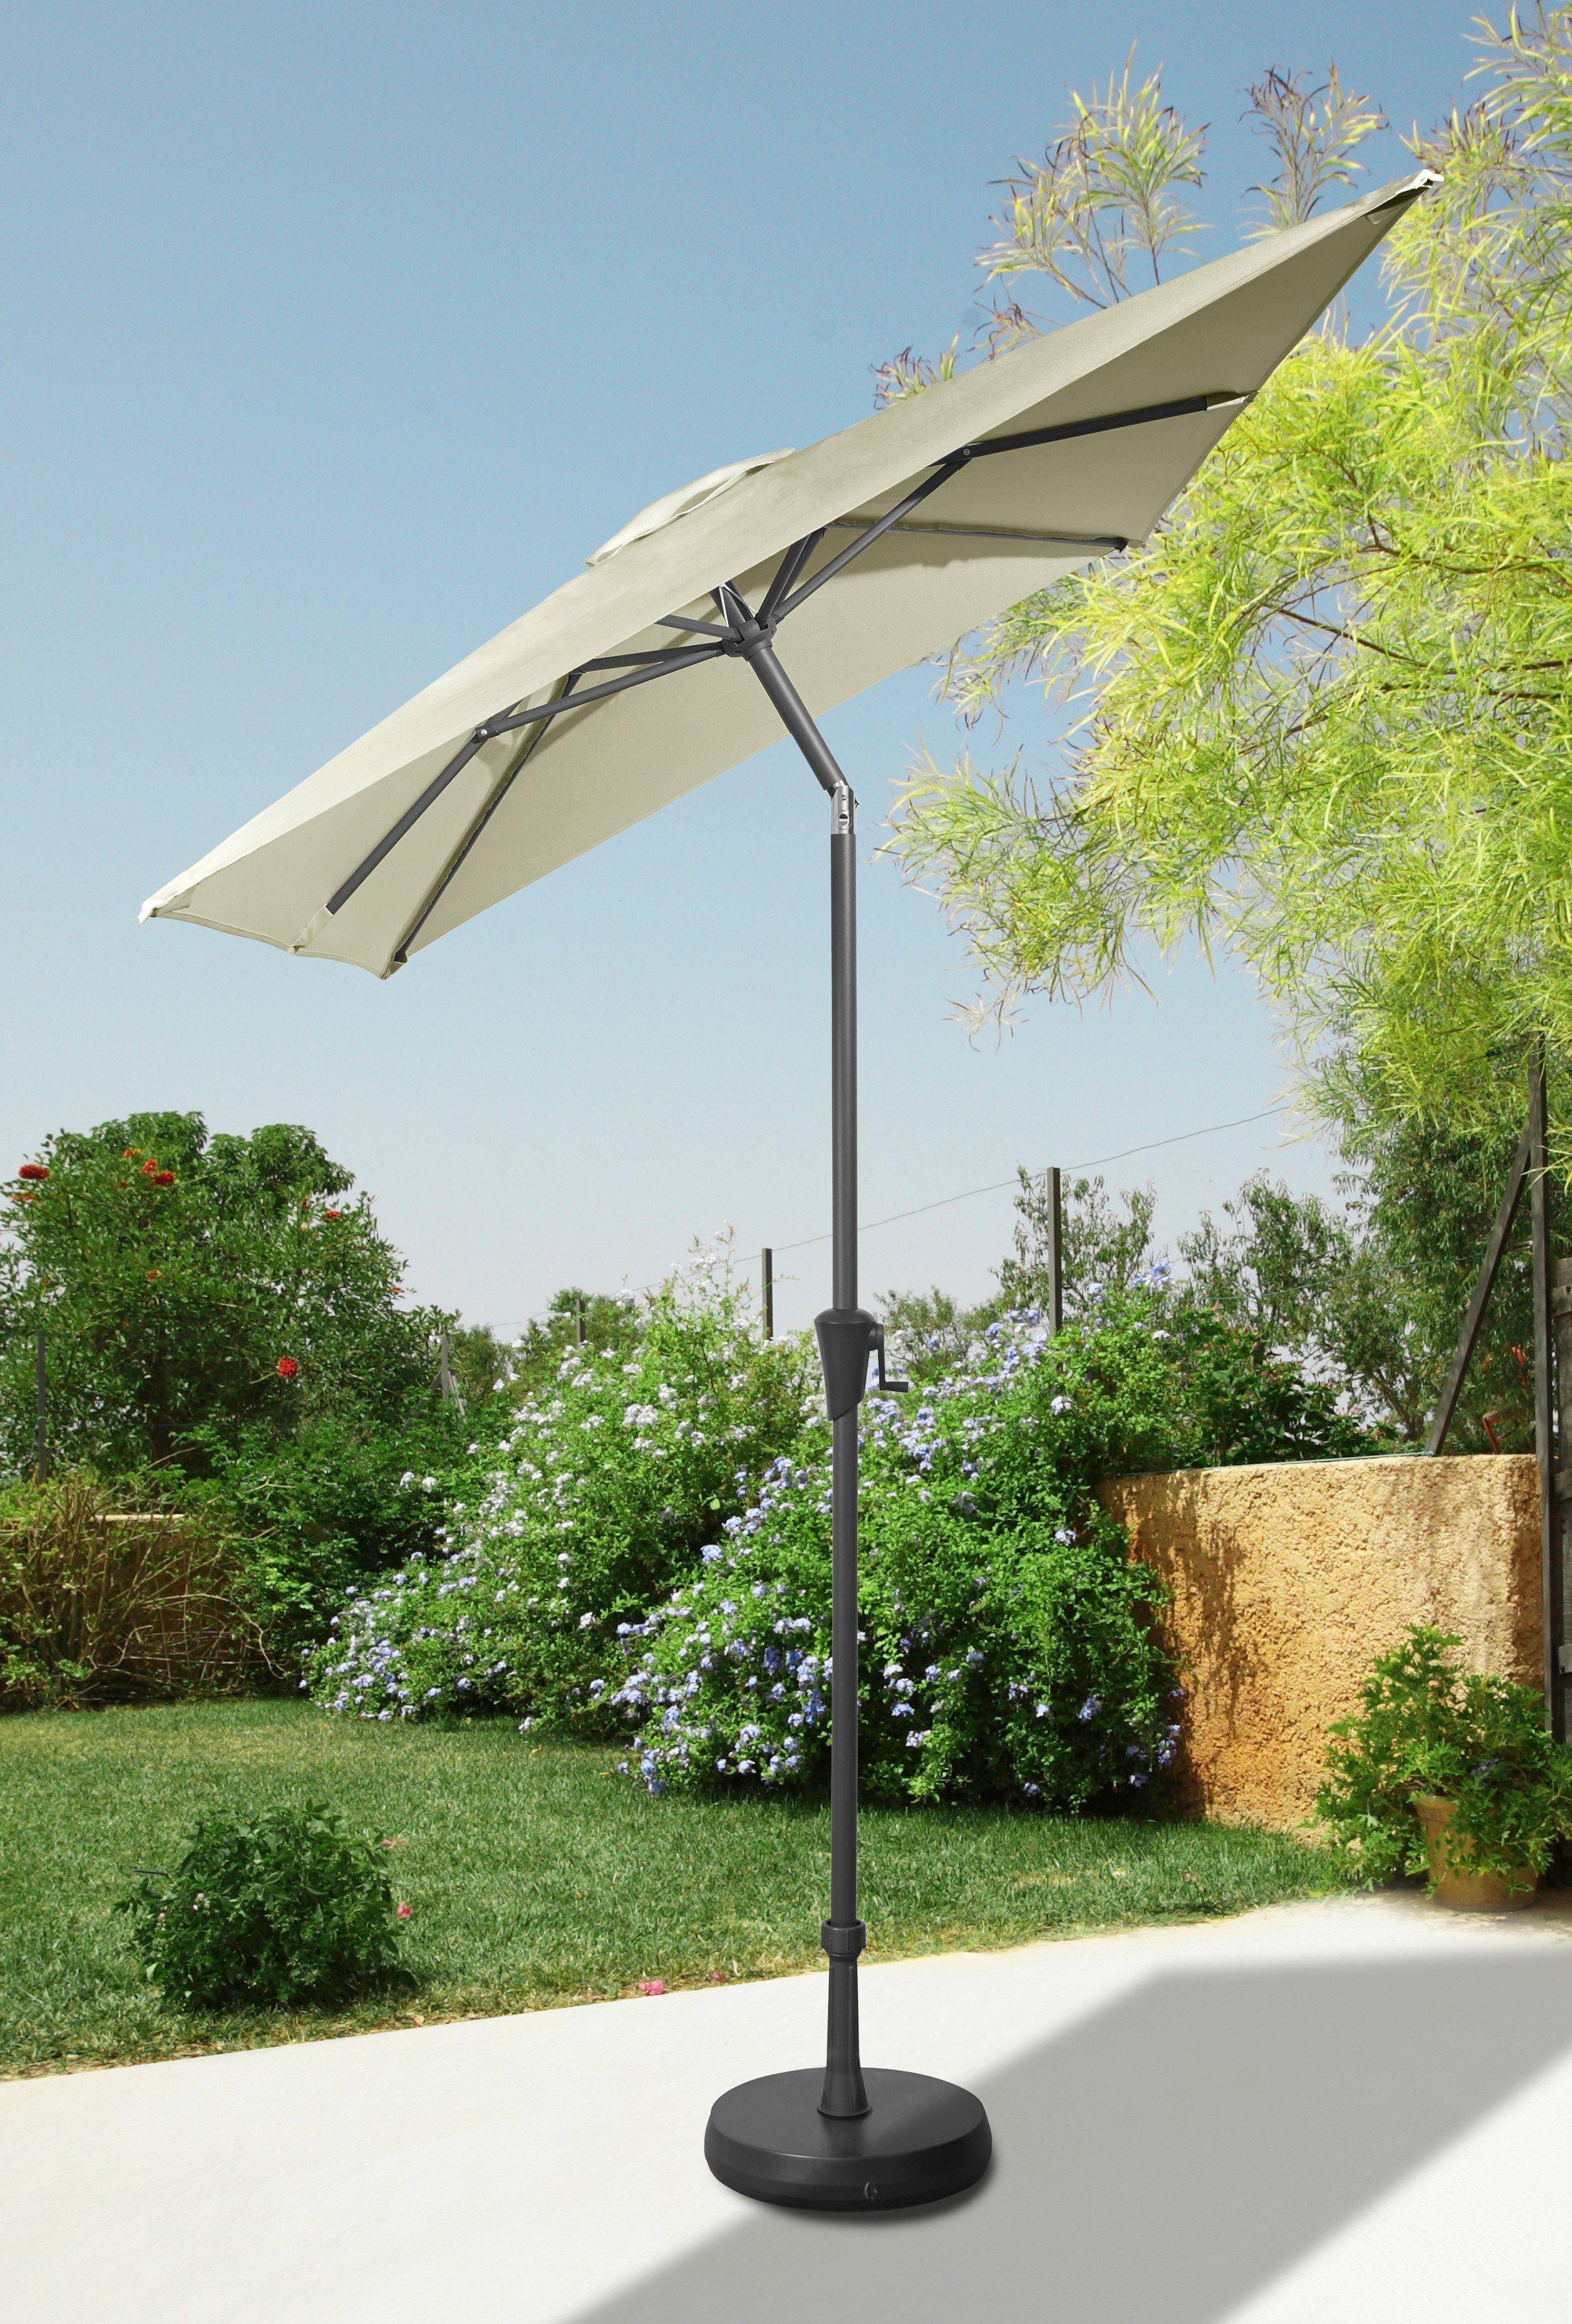 garten gut Sonnenschirm 160x230 cm, cremefarben